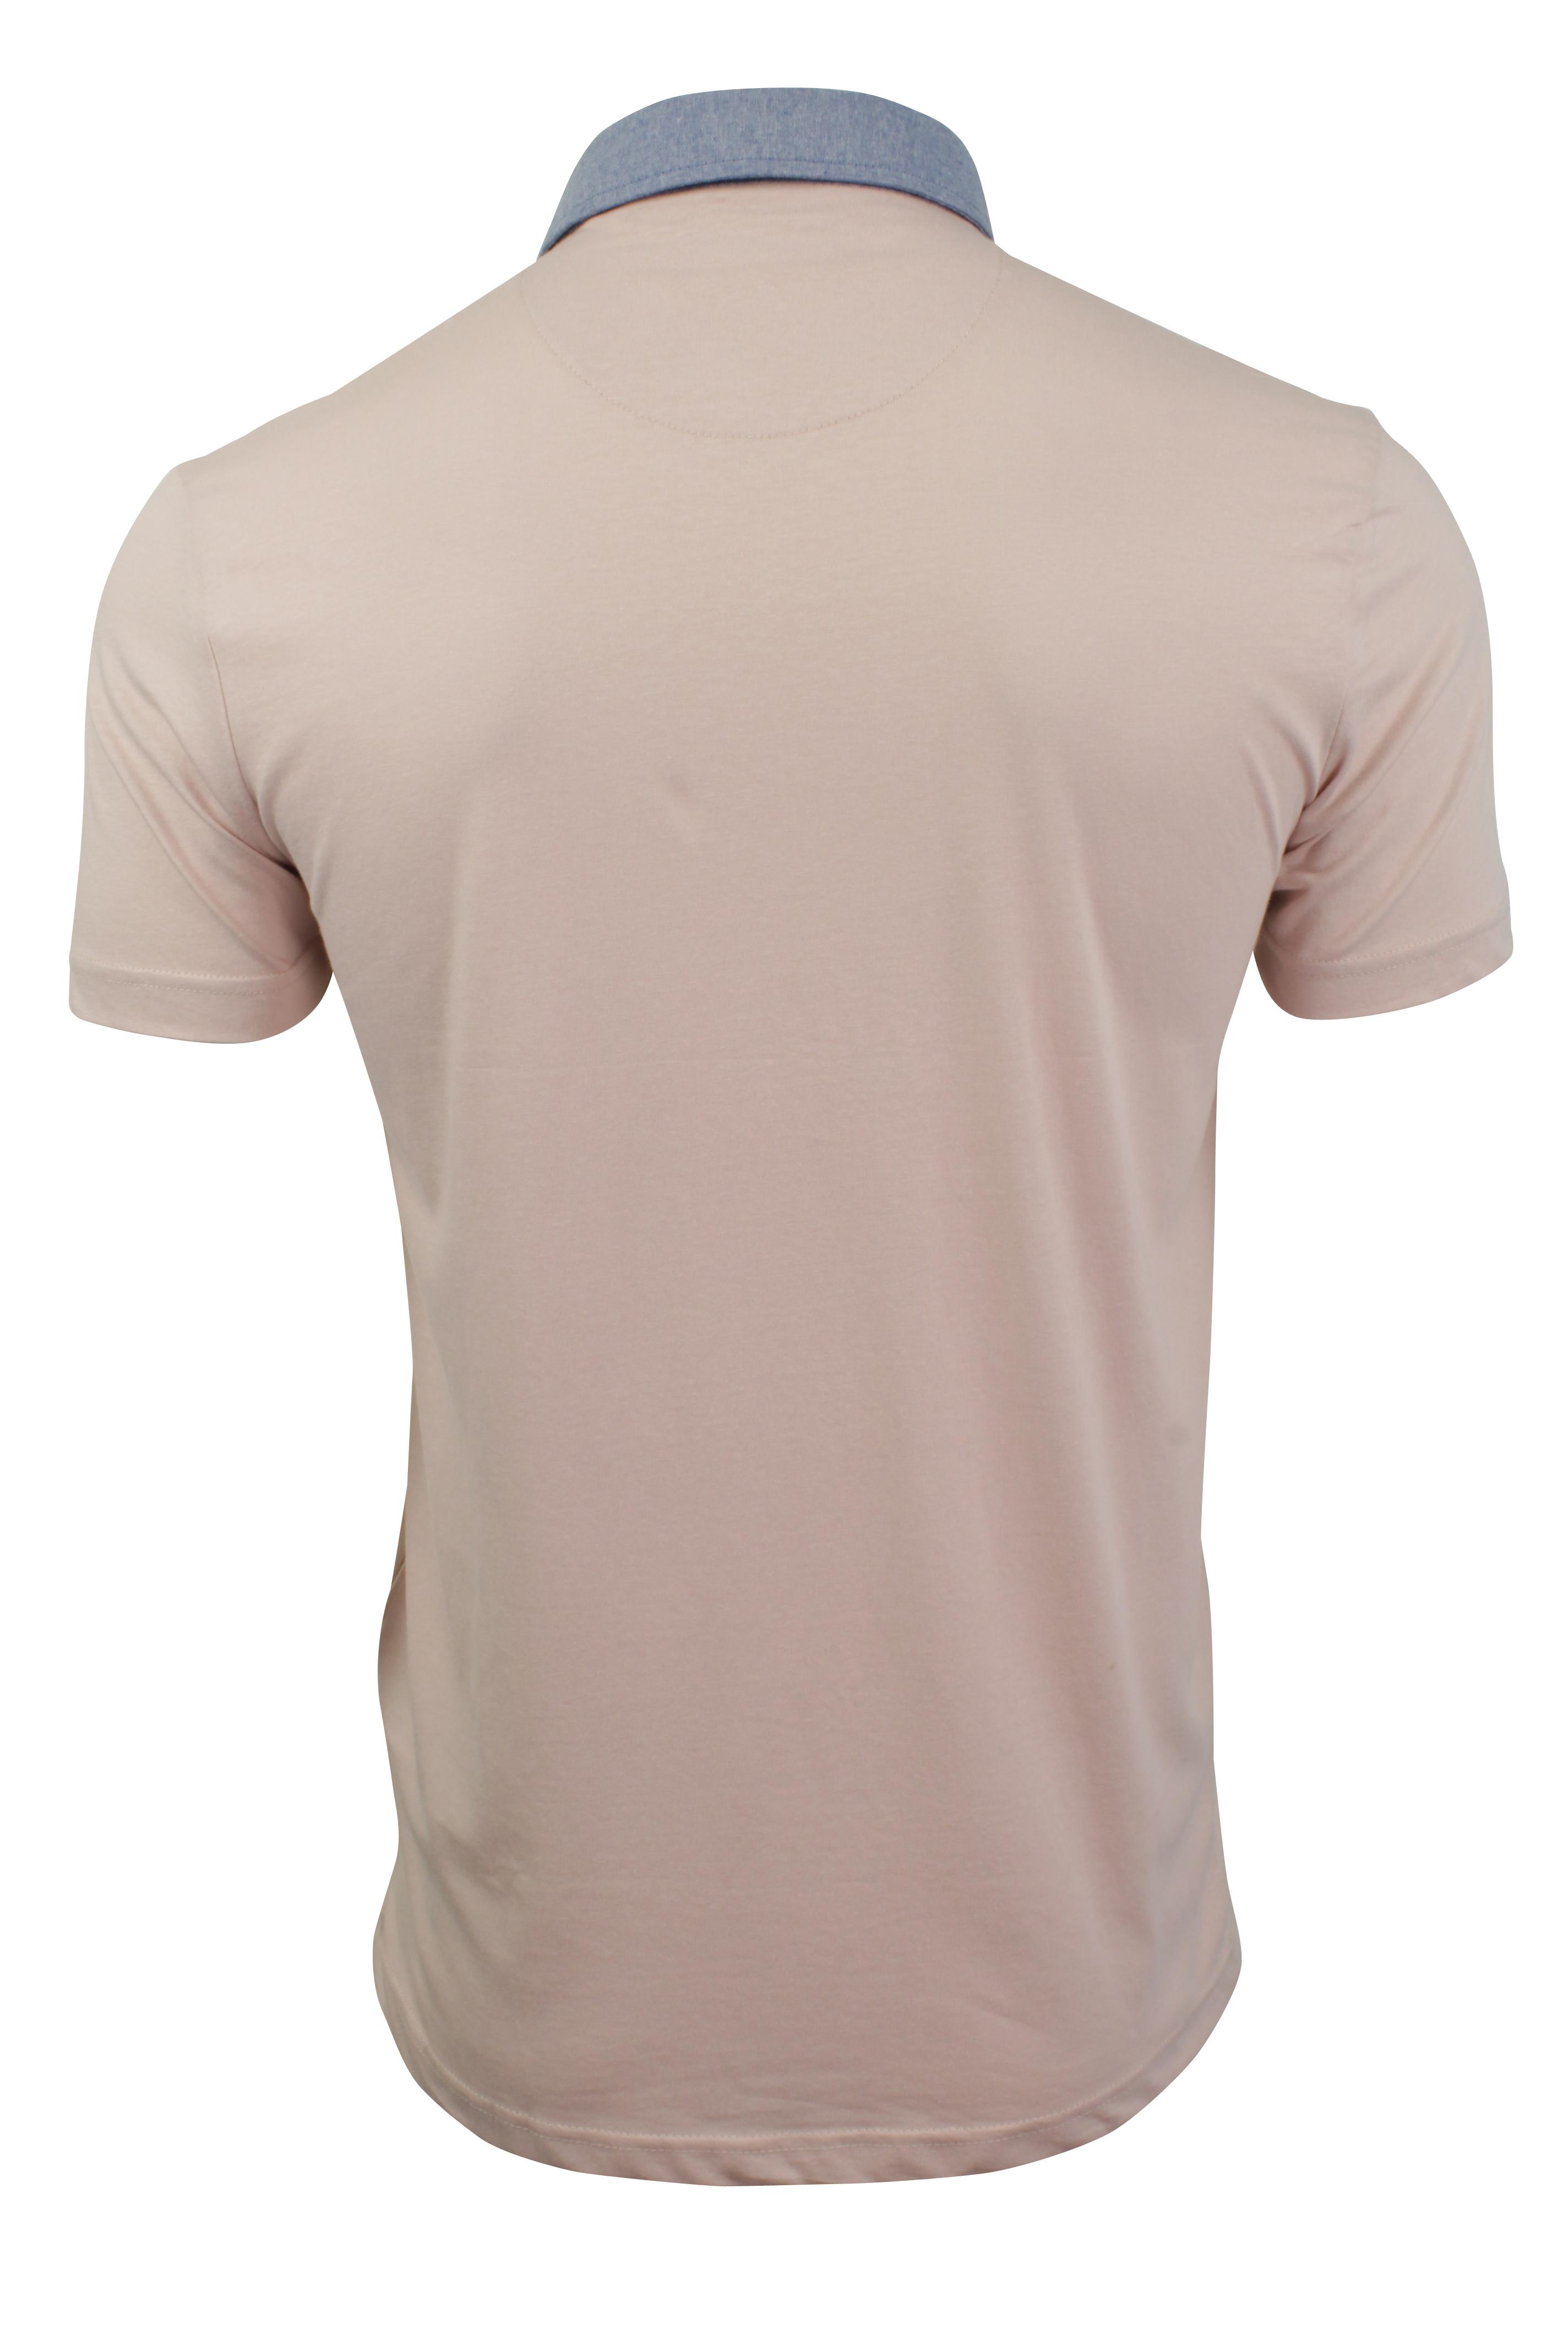 Mens-Polo-T-Shirt-Chimera-Brave-Soul-Denim-Chambray-Collar-Short-Sleeved-Cotton thumbnail 32